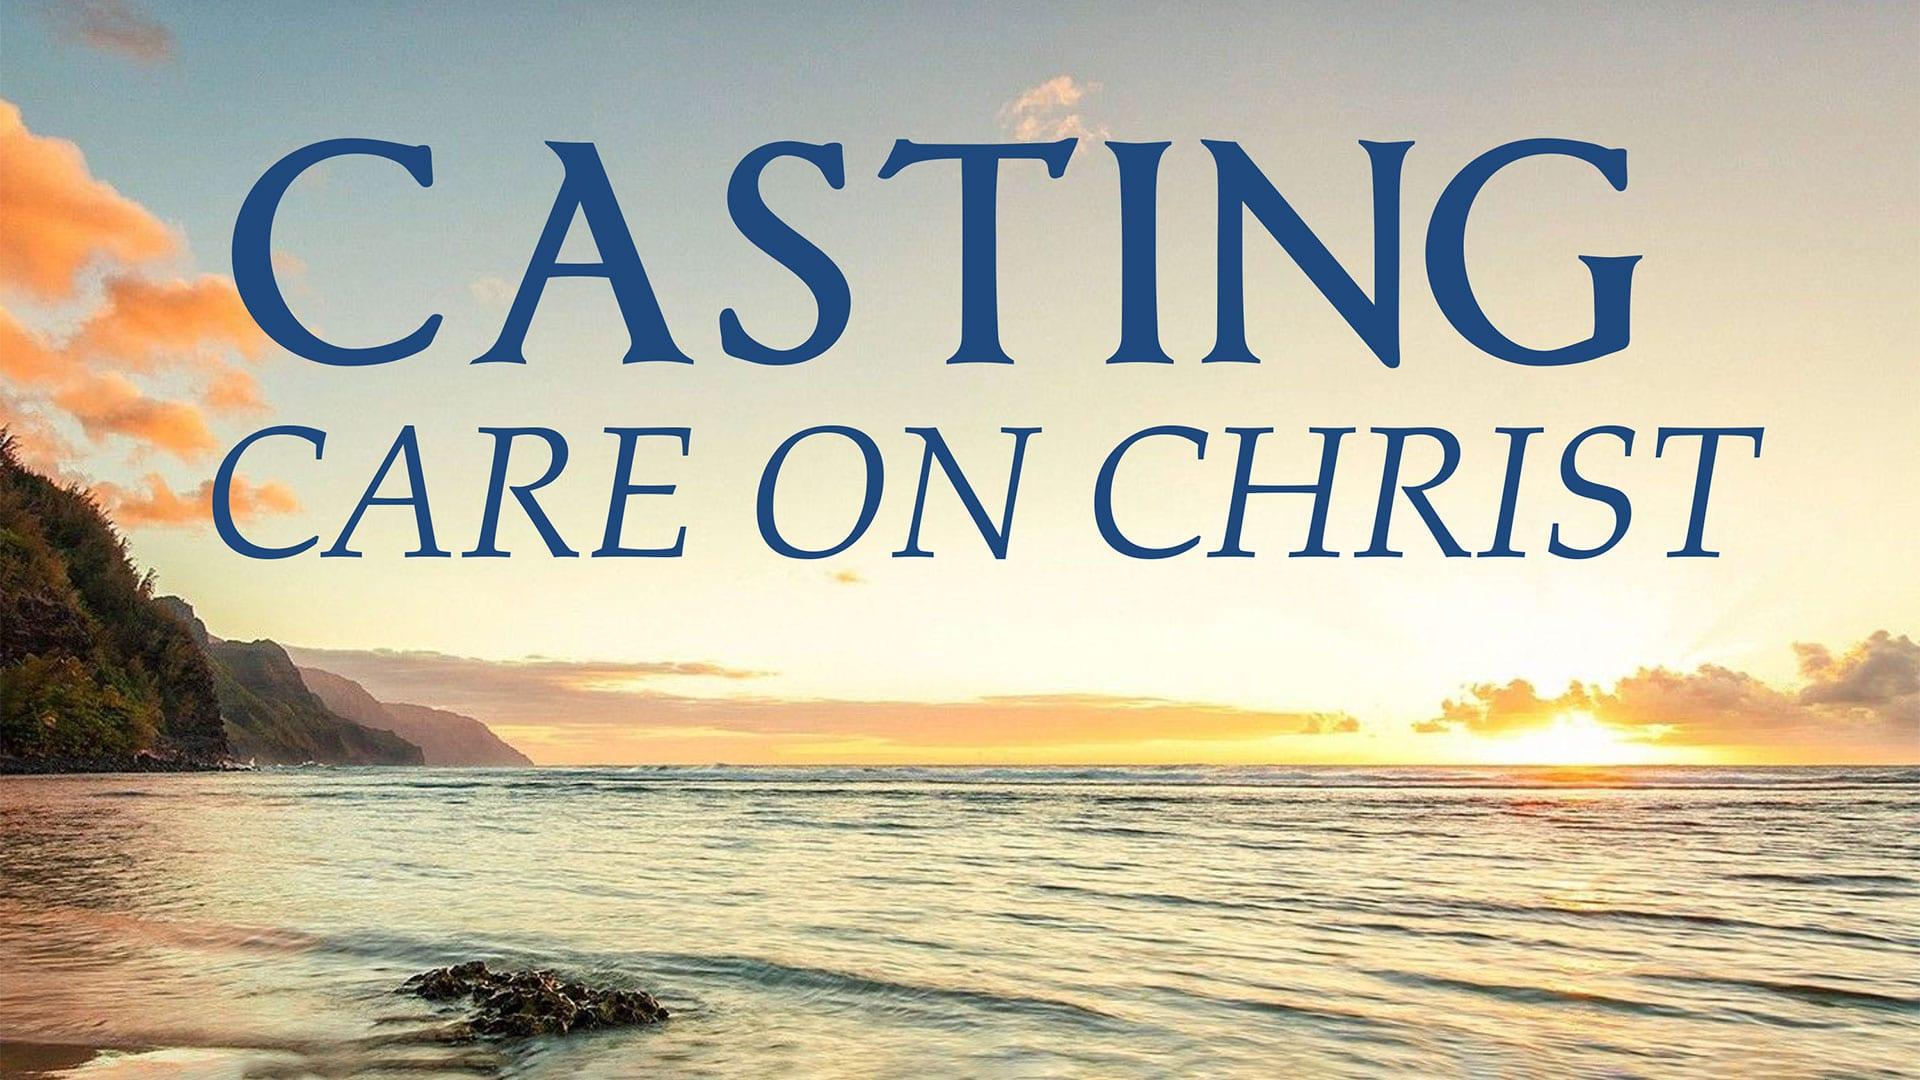 CBC_2020_12_27_PM_Casting_care_on_christ_Outline_Thumbnail_1920x1080